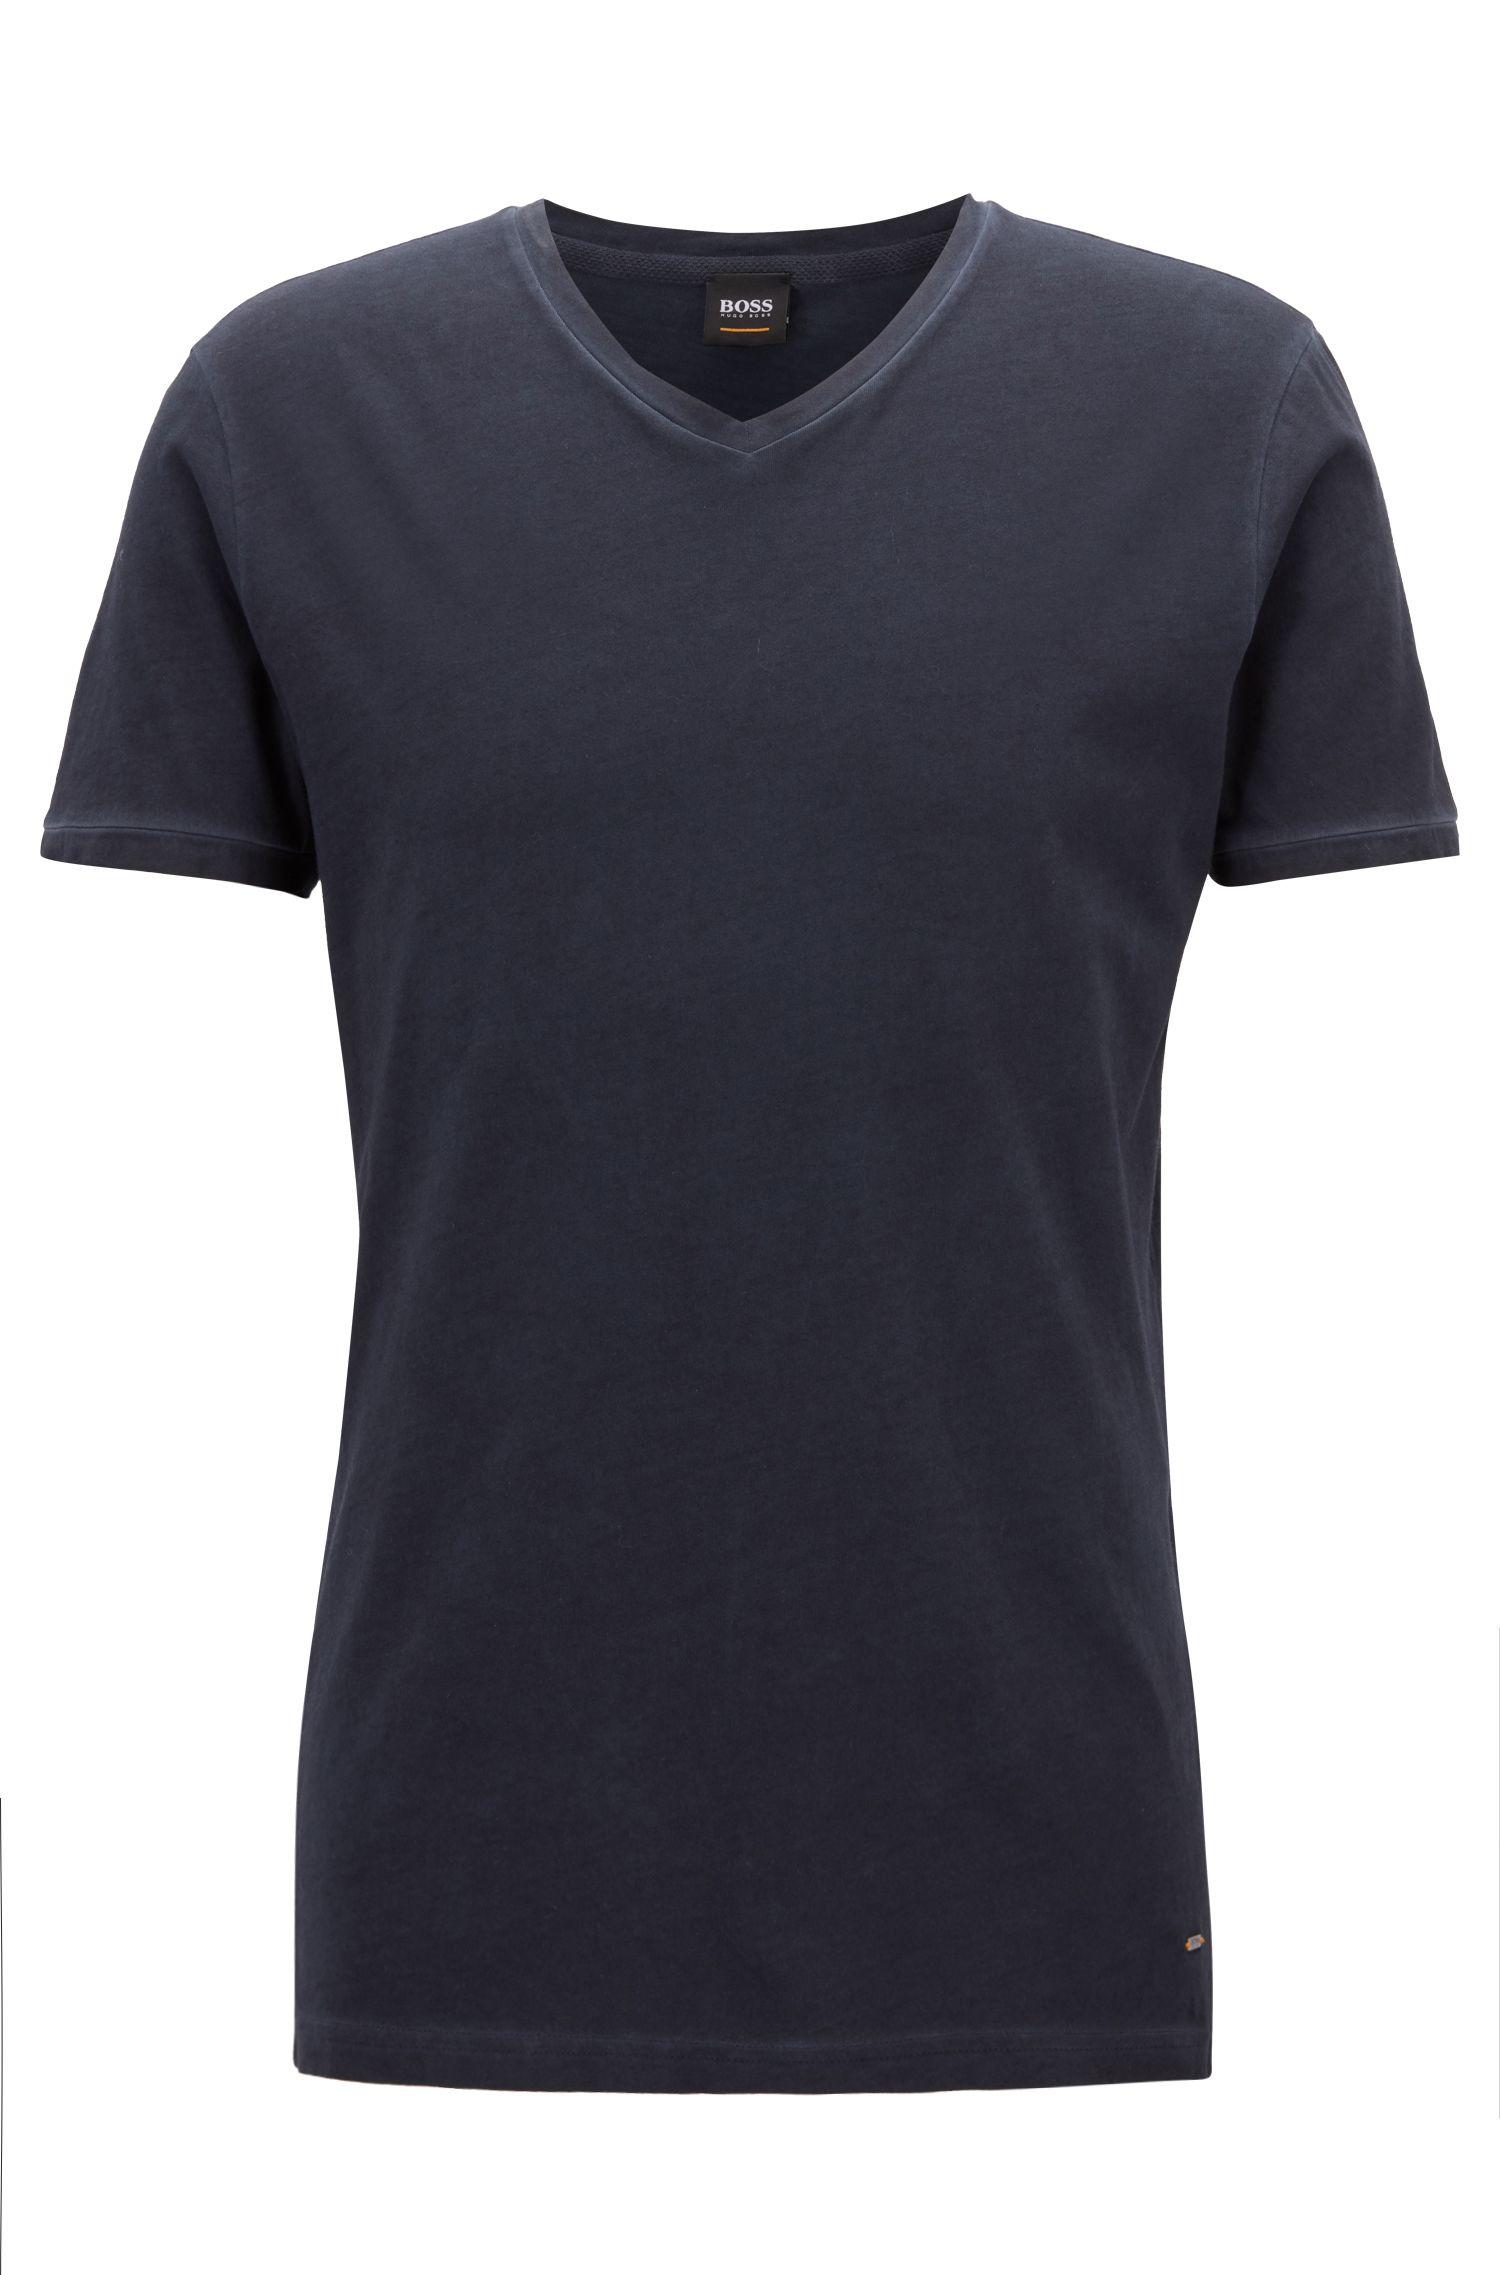 T-shirt Regular Fit en coton, à colV, Bleu foncé